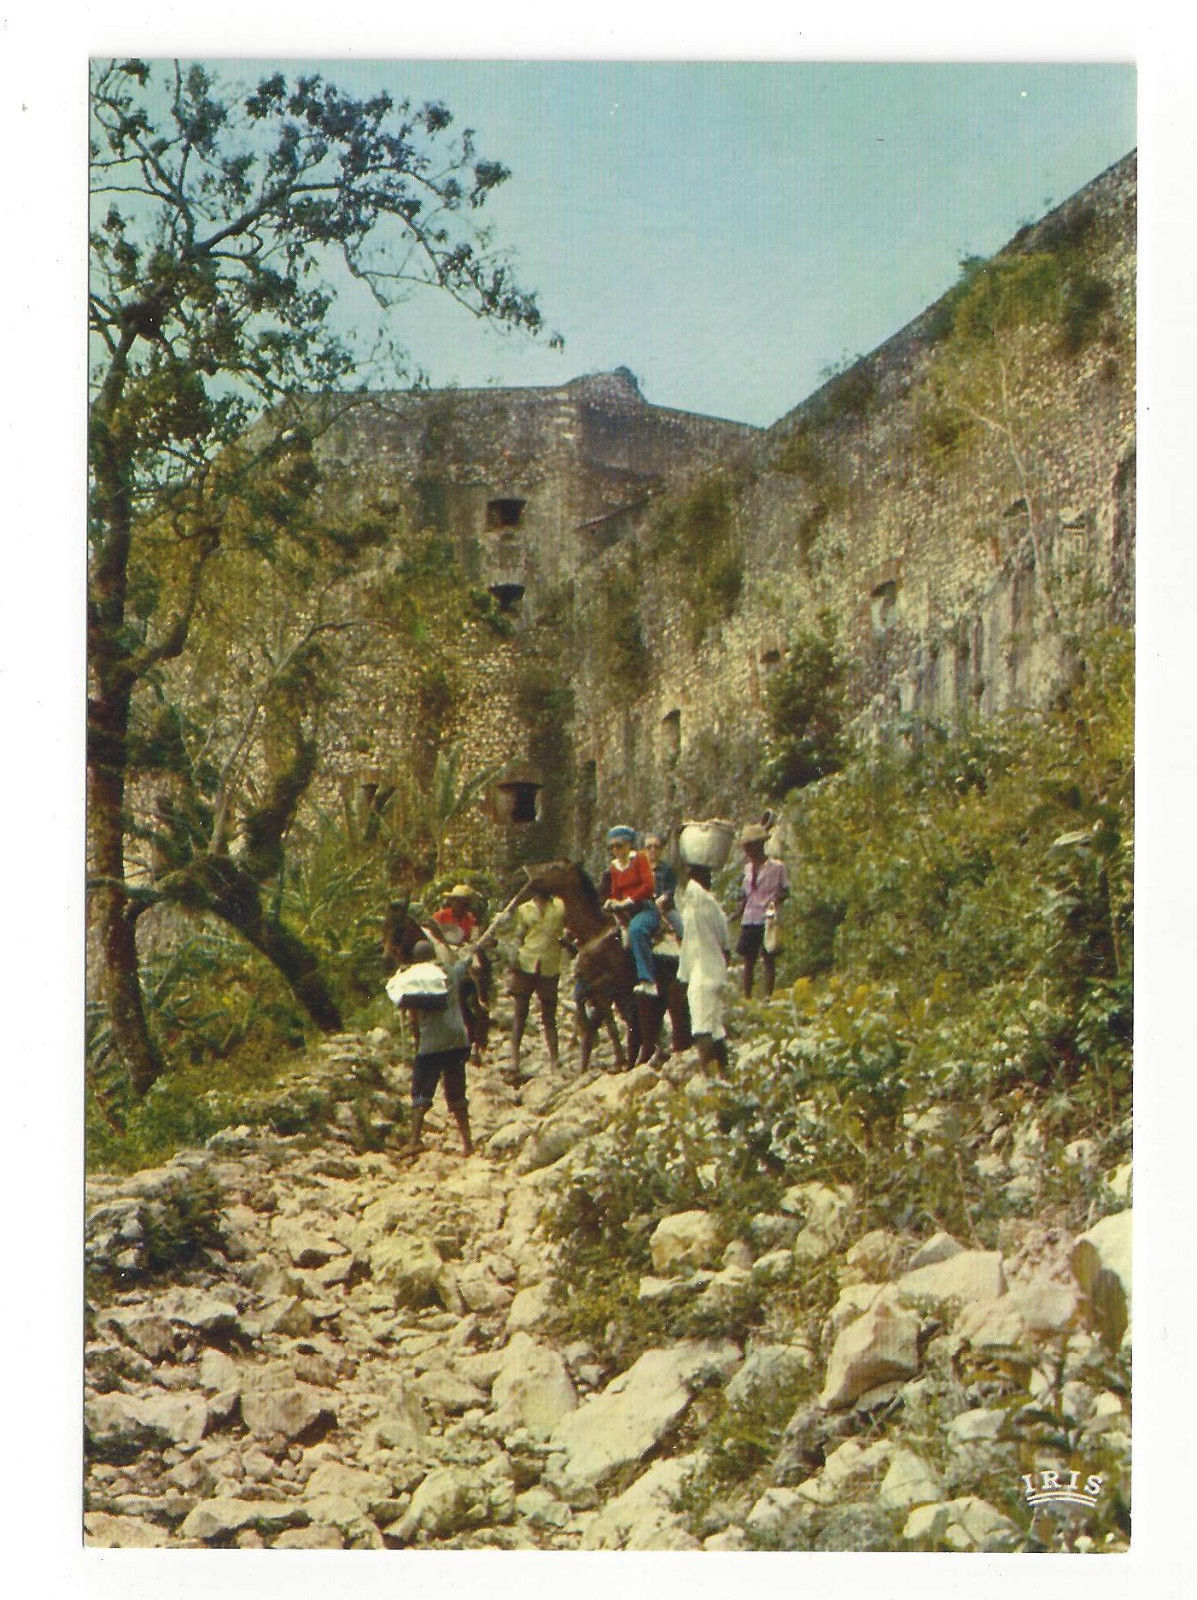 Haiti Citadel La Ferriere Horse Back Trail Caribbean Vtg Postcard 4X6